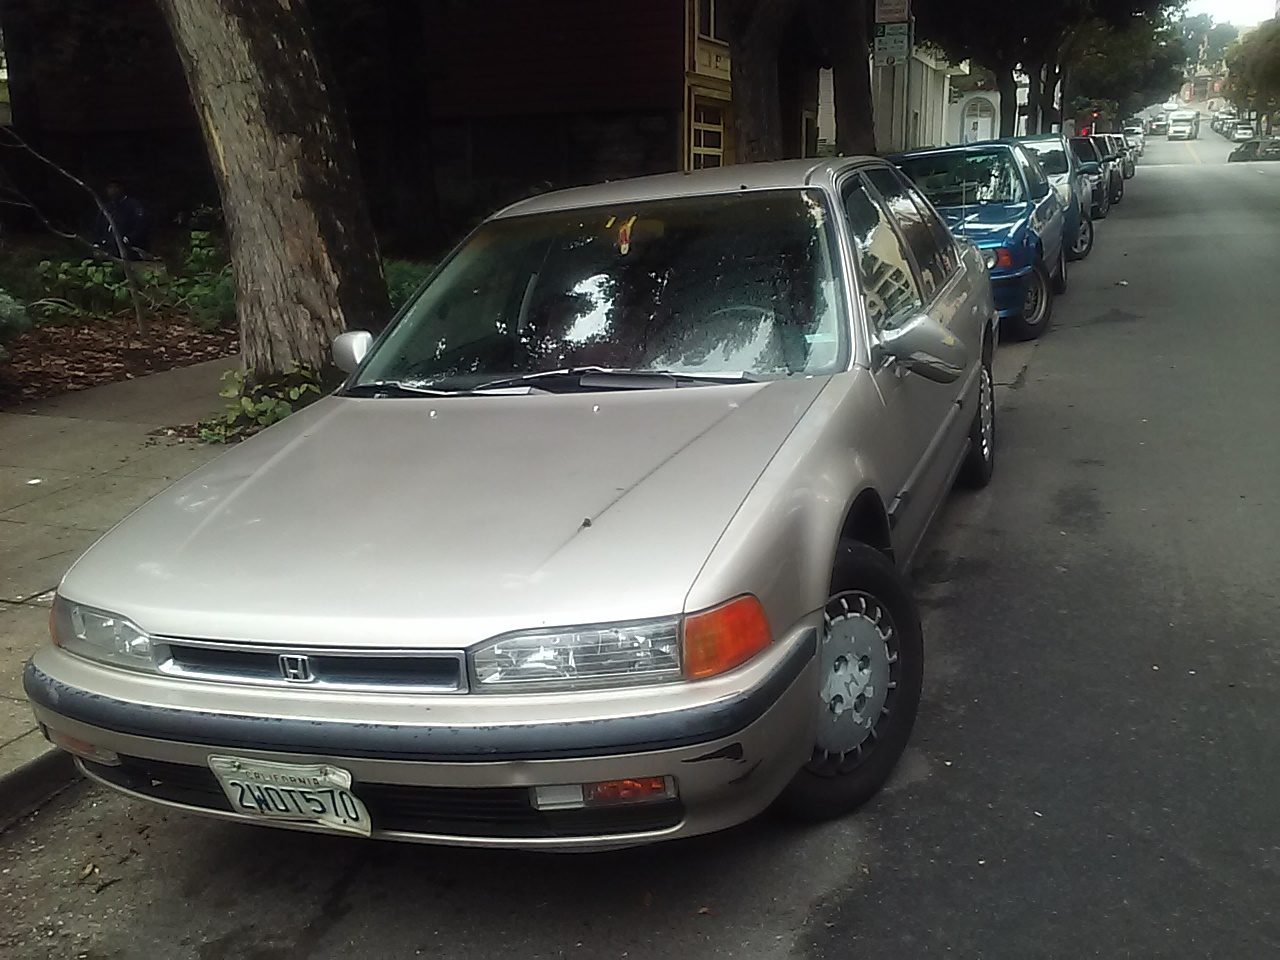 Cash For Cars Clifton, NJ